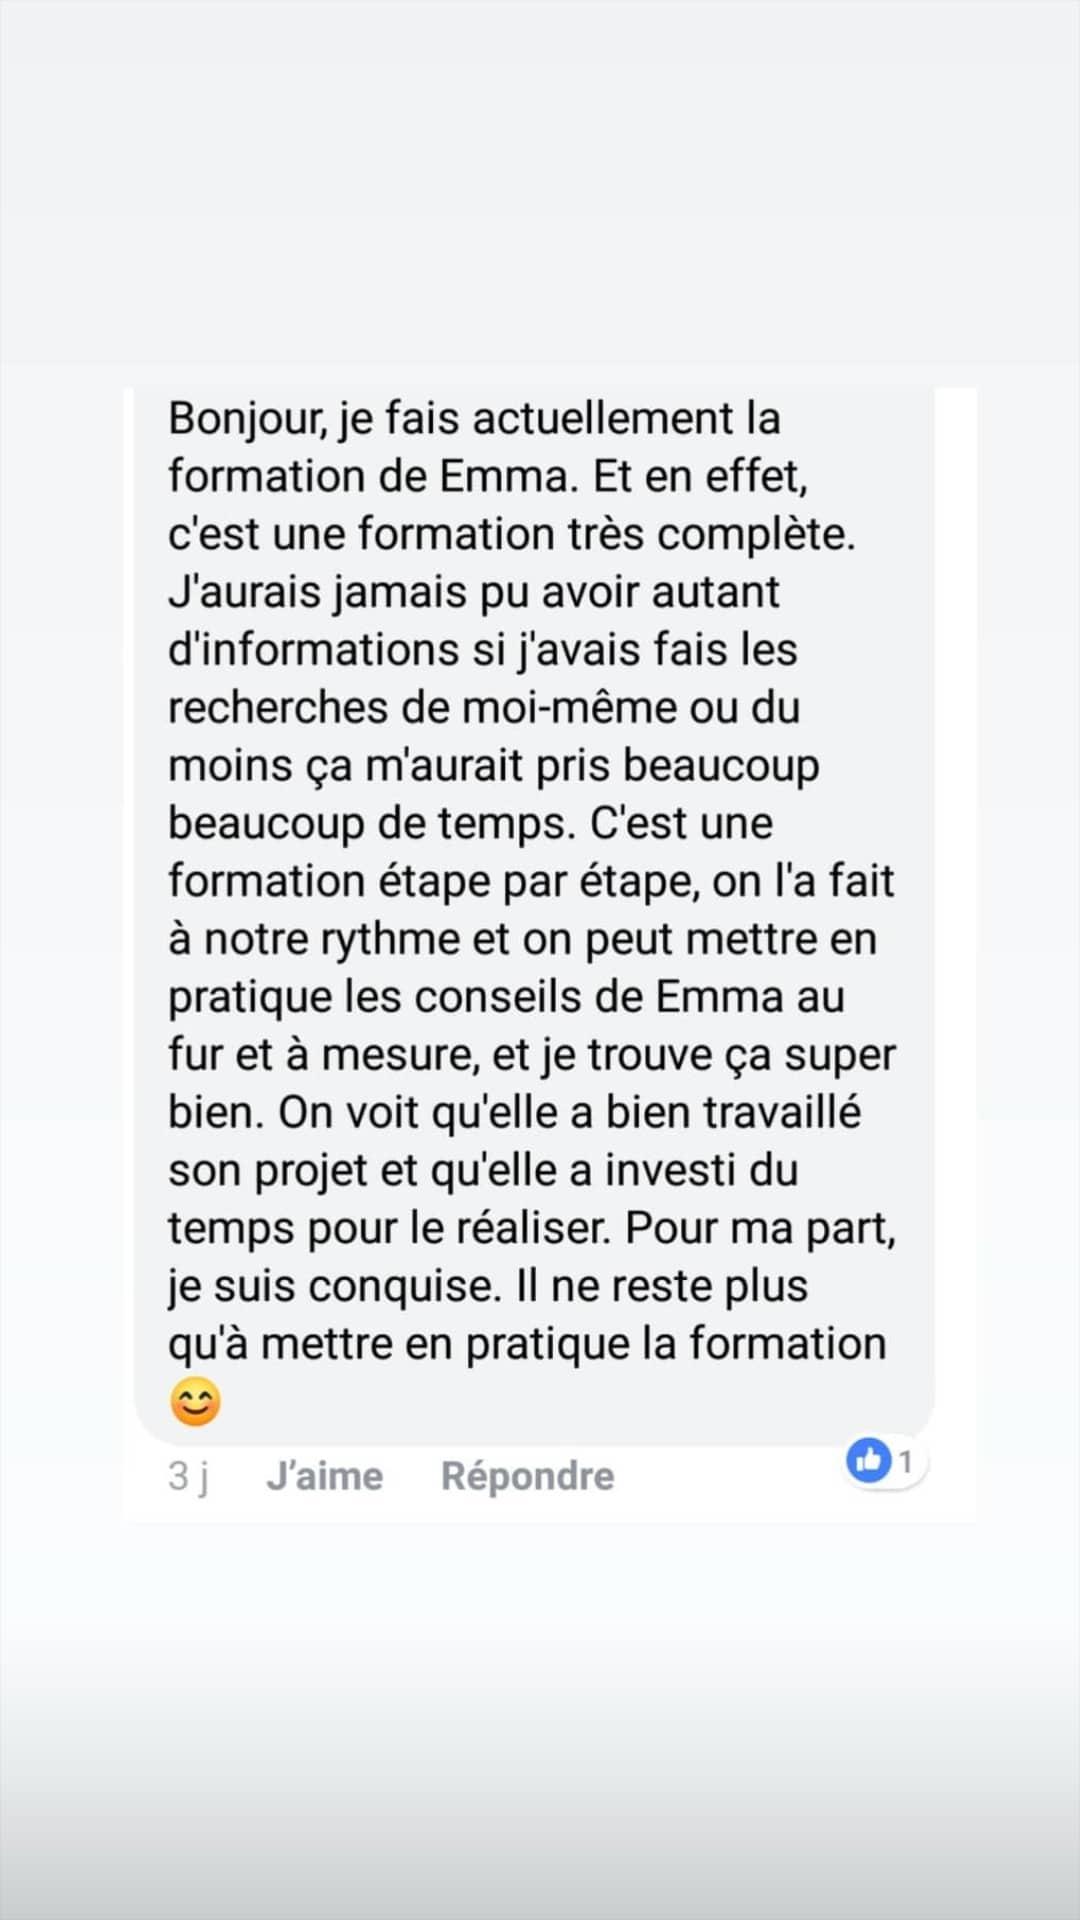 Avis-Les-Reines-Affiliation_20200605_084439